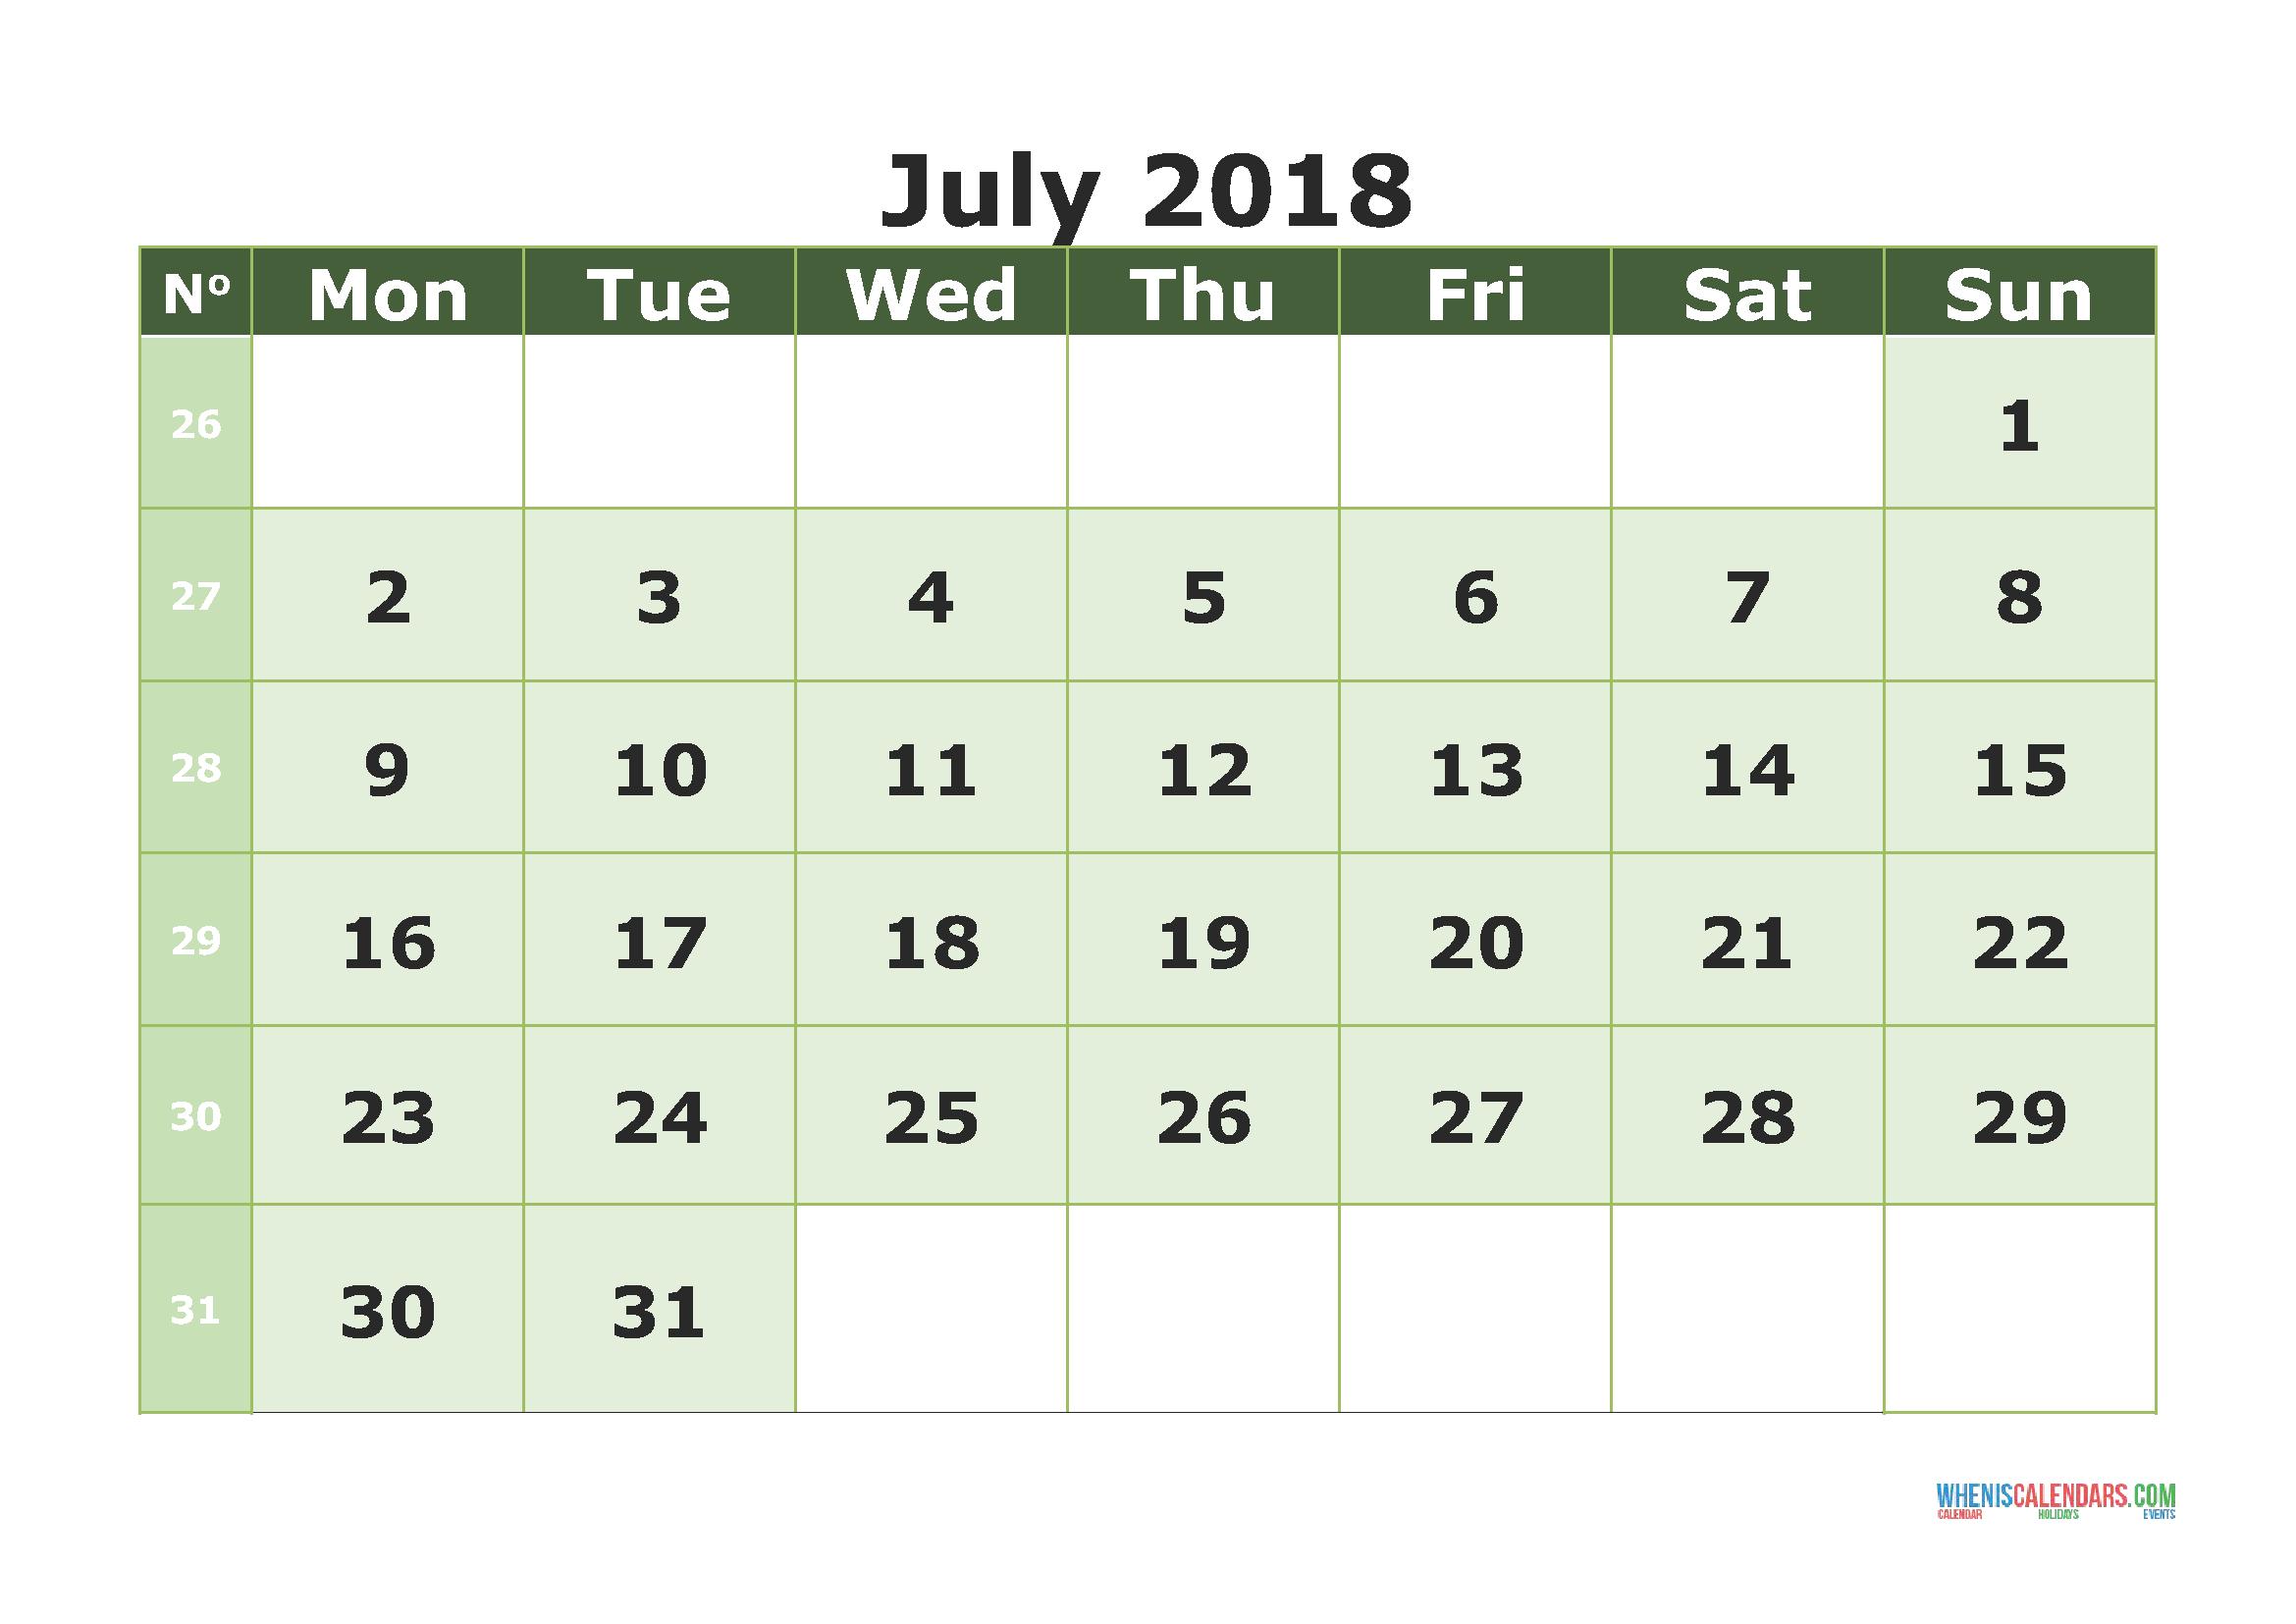 Printable Calendar July 2018 with week numbers (Monday